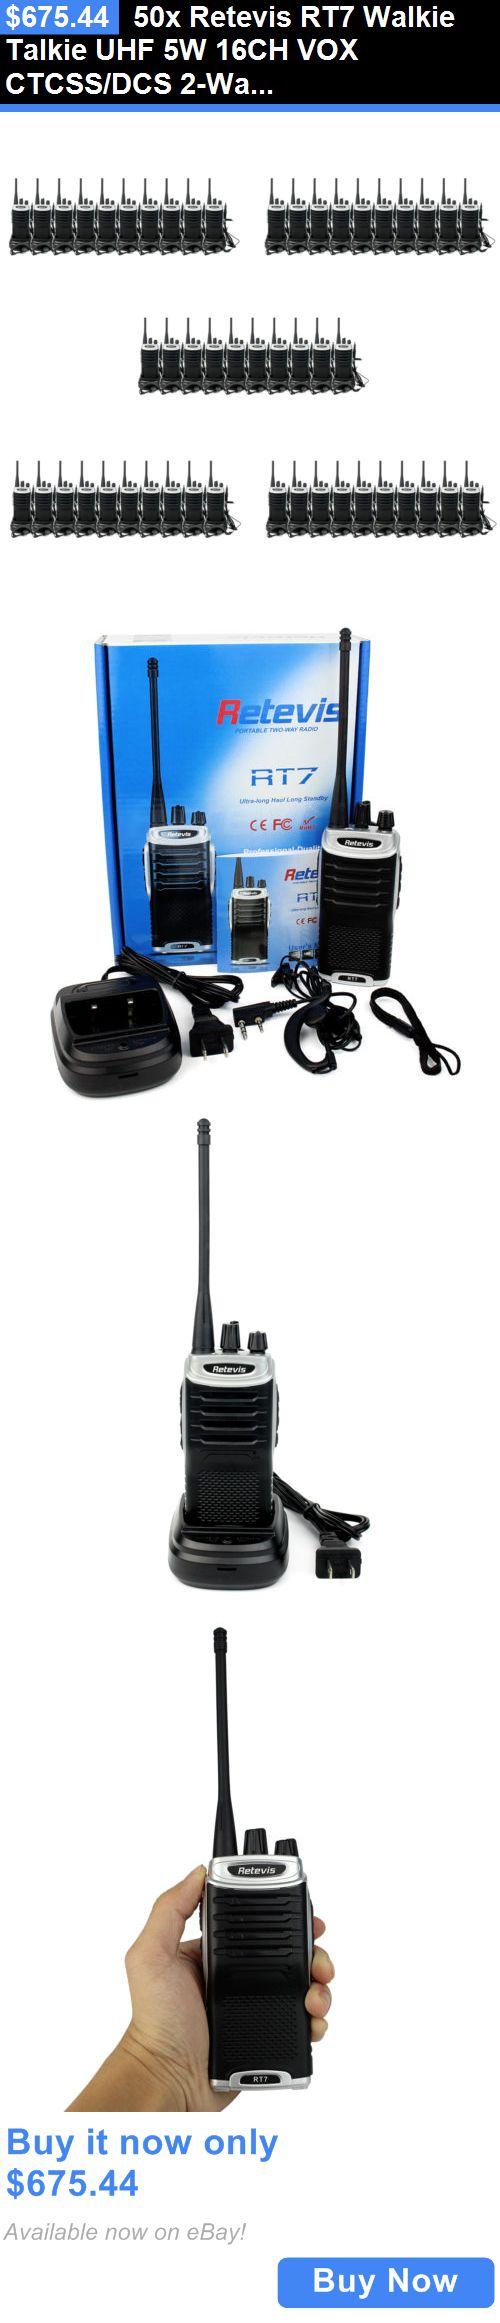 Radio Communication: 50X Retevis Rt7 Walkie Talkie Uhf 5W 16Ch Vox Ctcss/Dcs 2-Way Fm Radio Us Local BUY IT NOW ONLY: $675.44